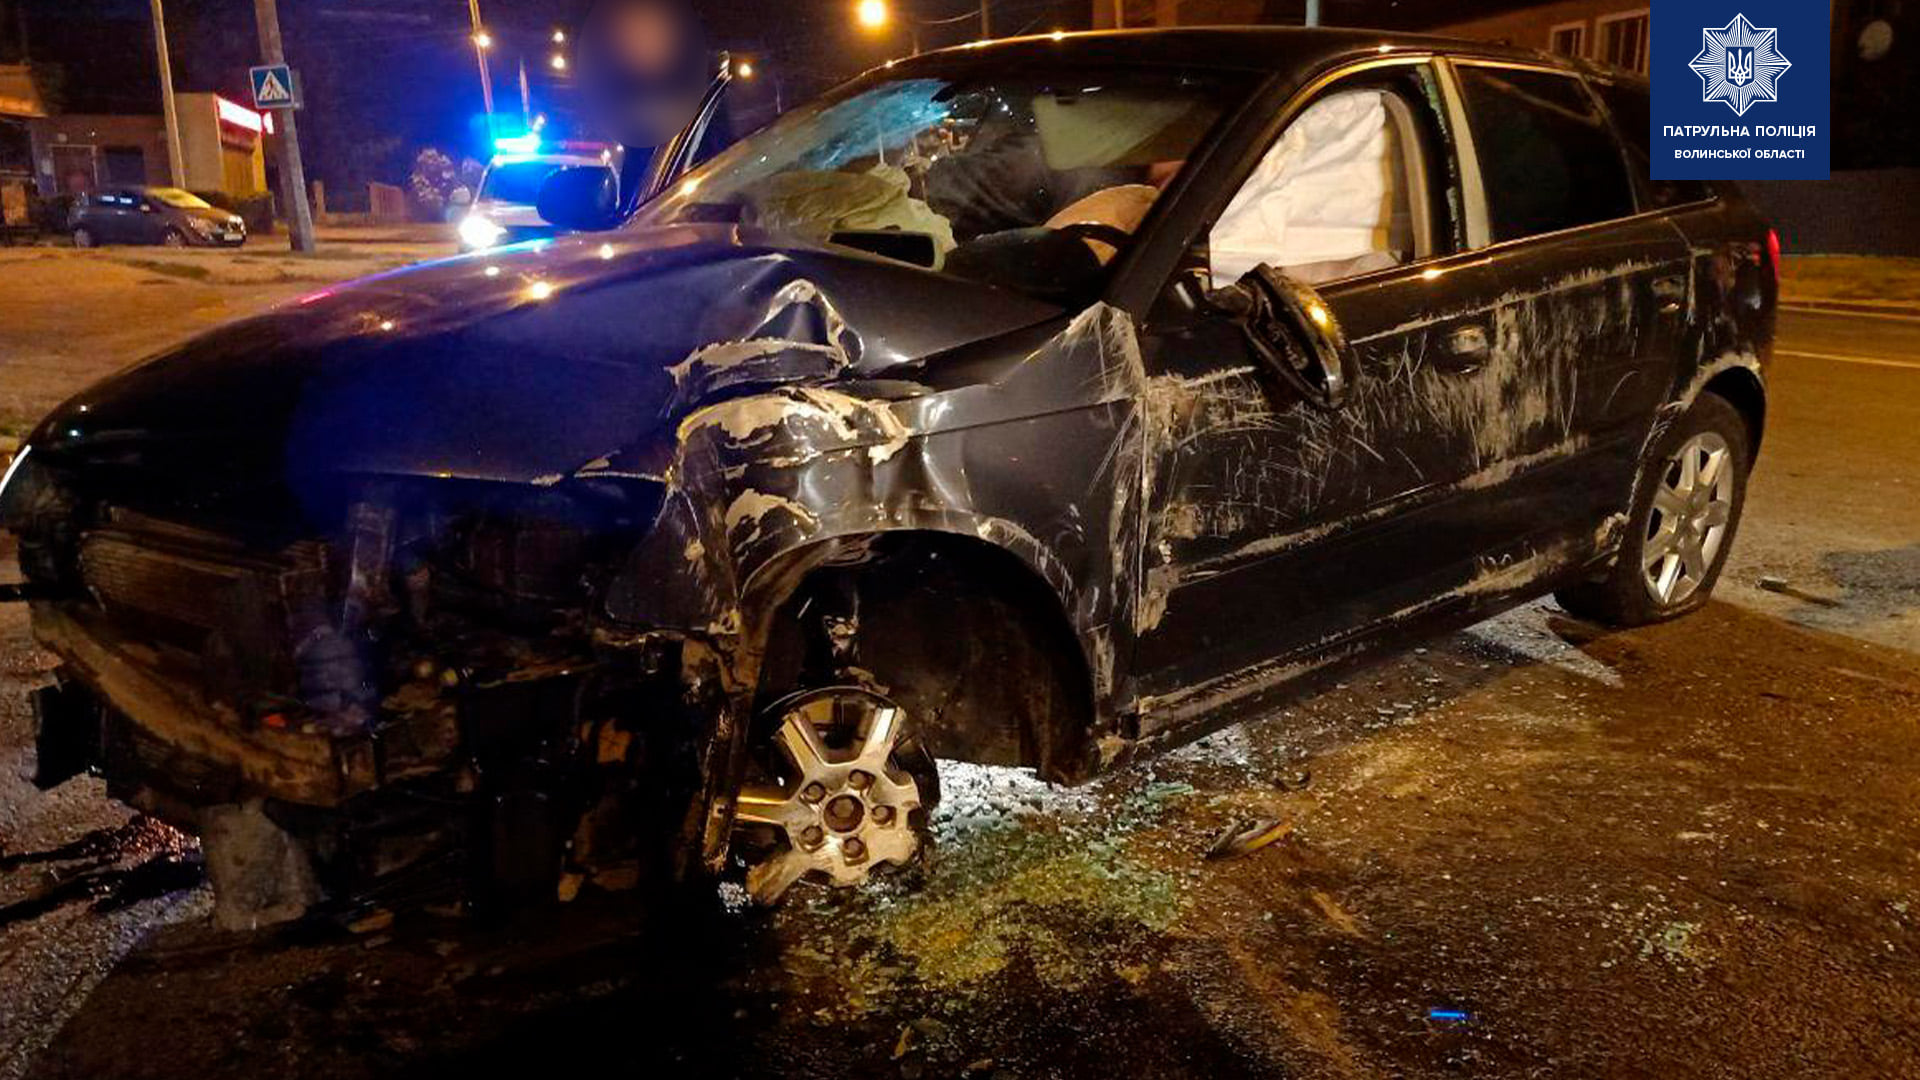 Нічна ДТП у Луцьку за участю неповнолітнього водія: патрульні склали три адміністративні матеріали